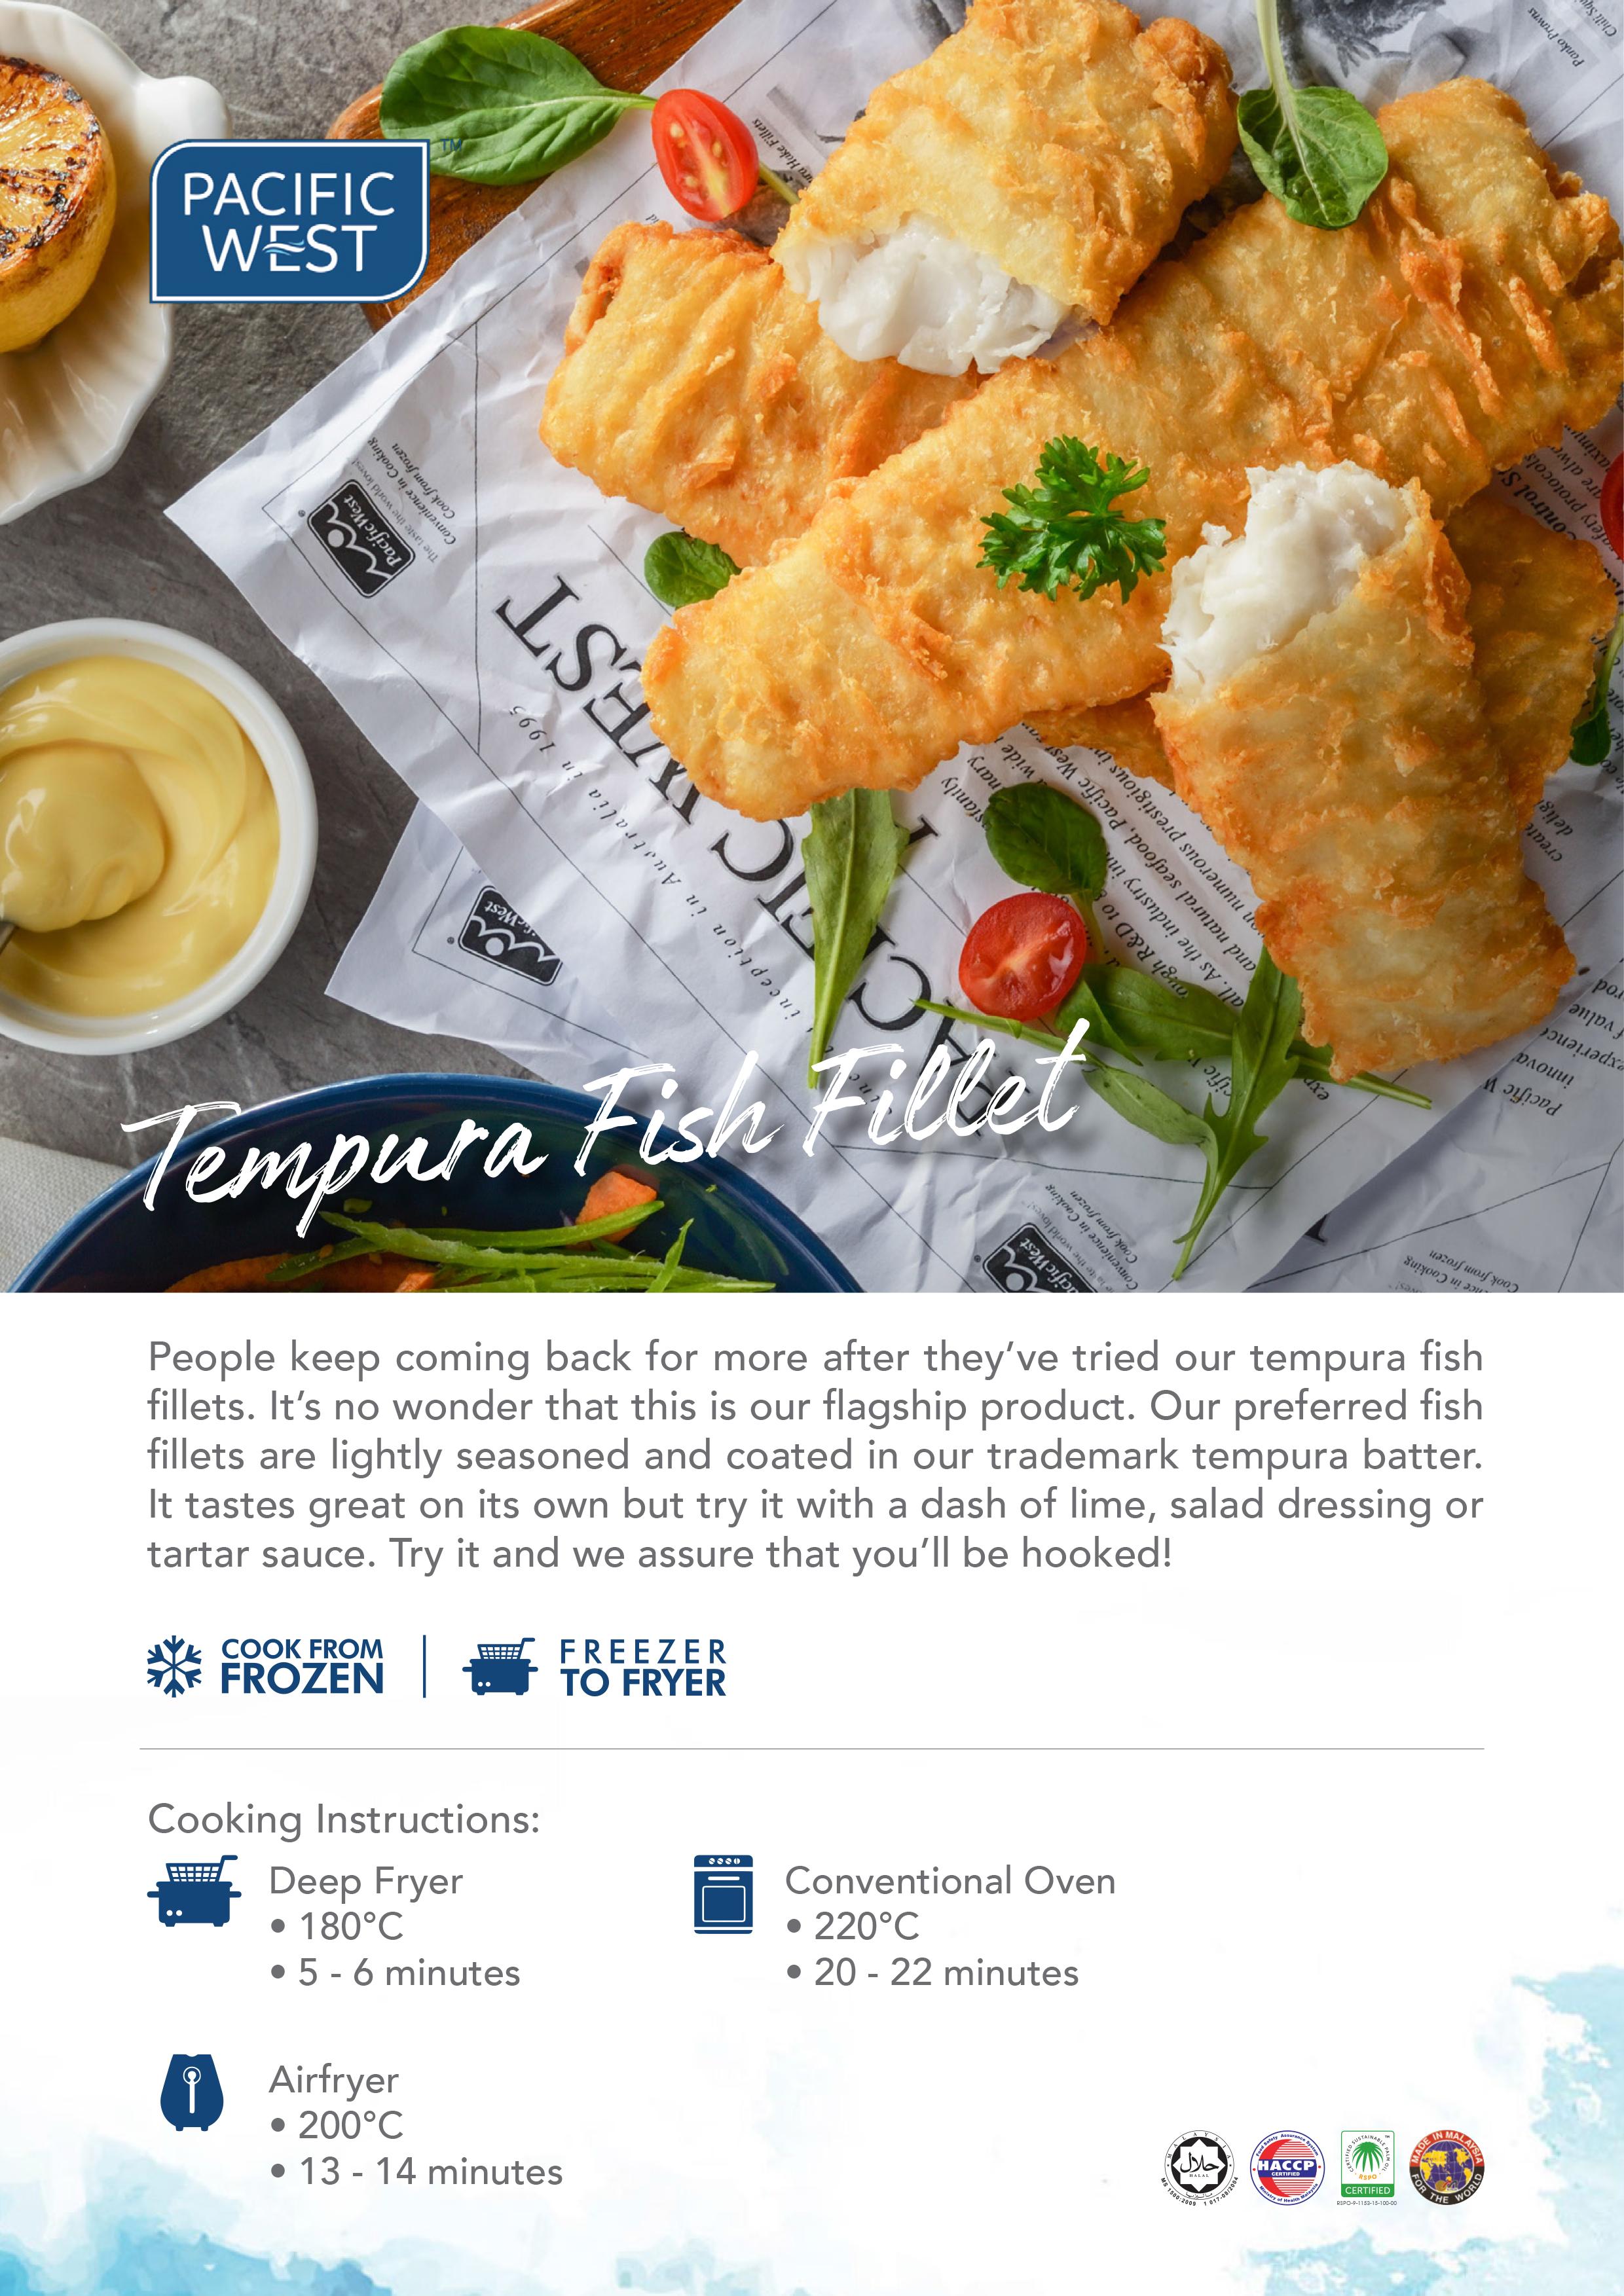 Pacific West Tempura Fish Fillet